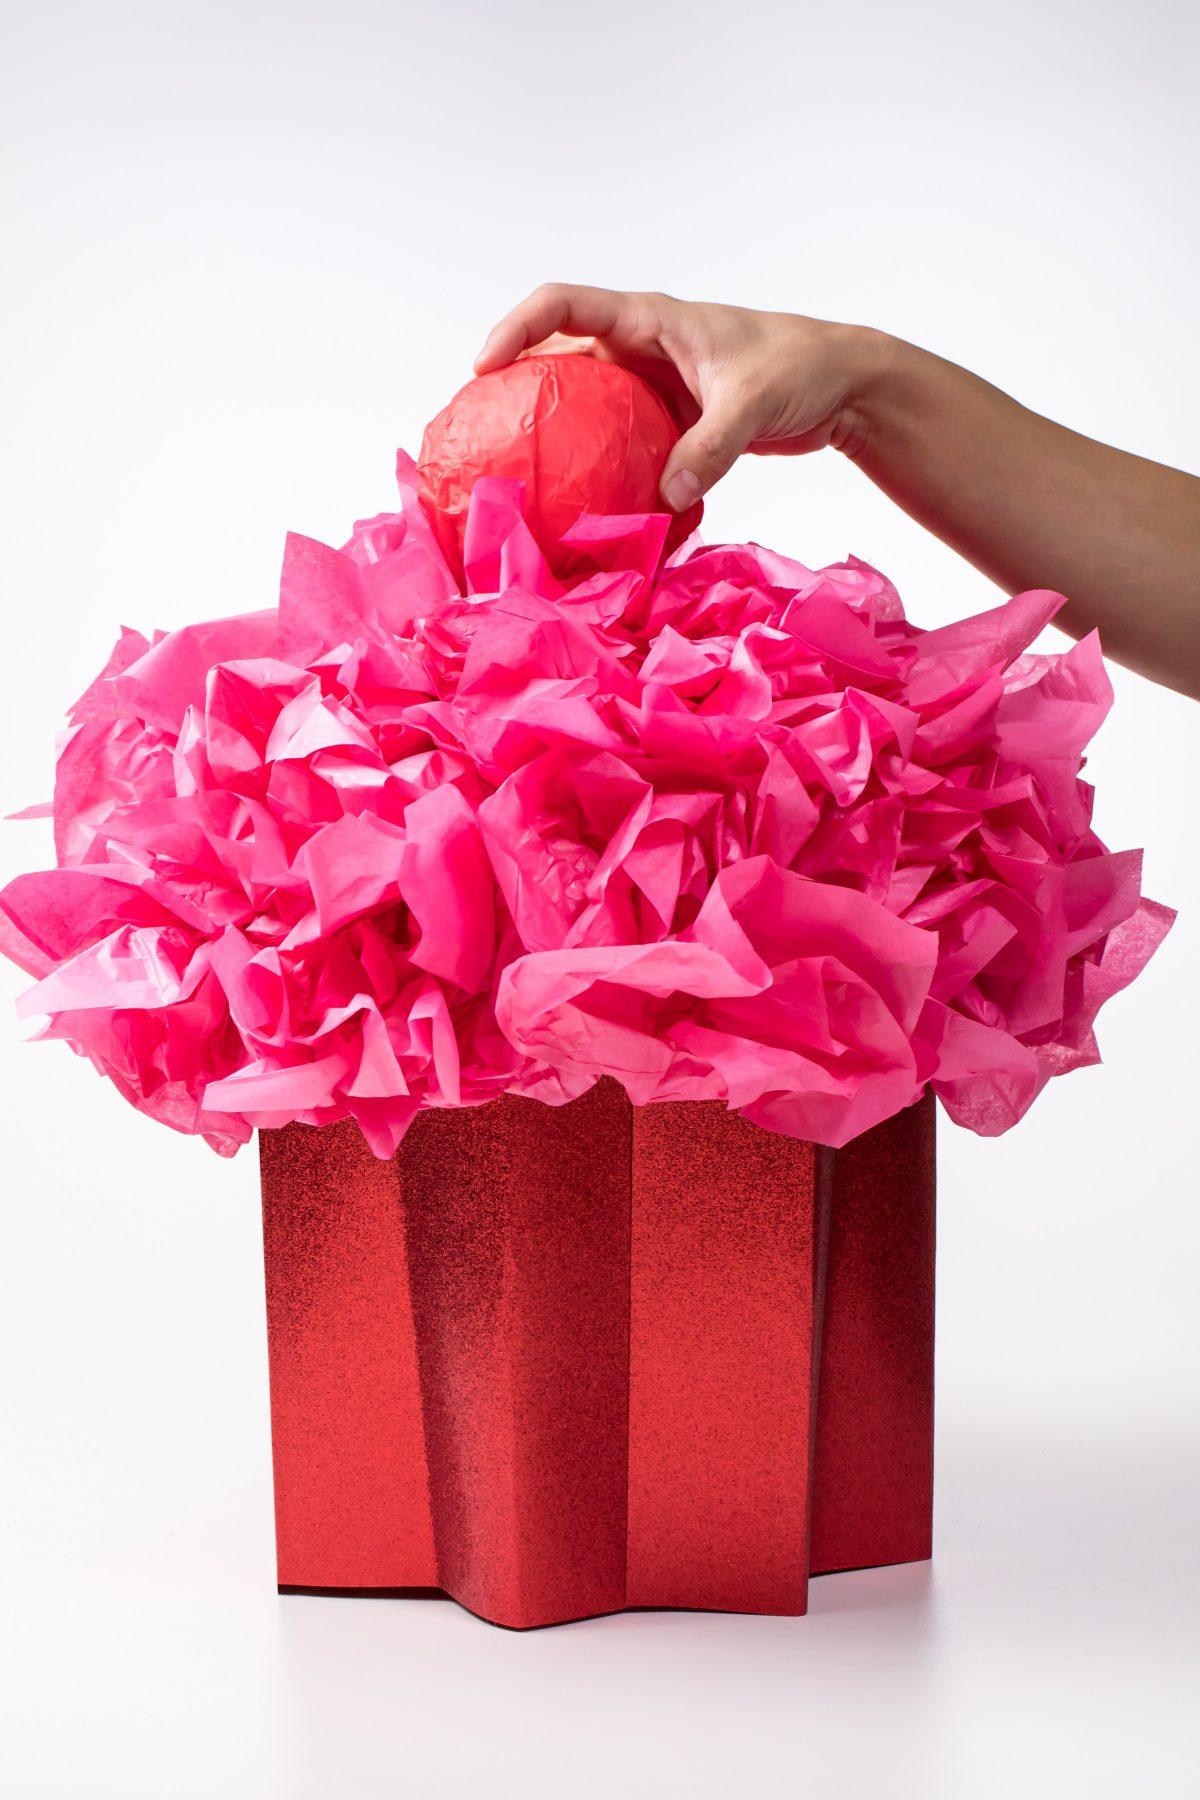 5D4B8230 - Cupcake Valentine Day Box - Finish cupcake